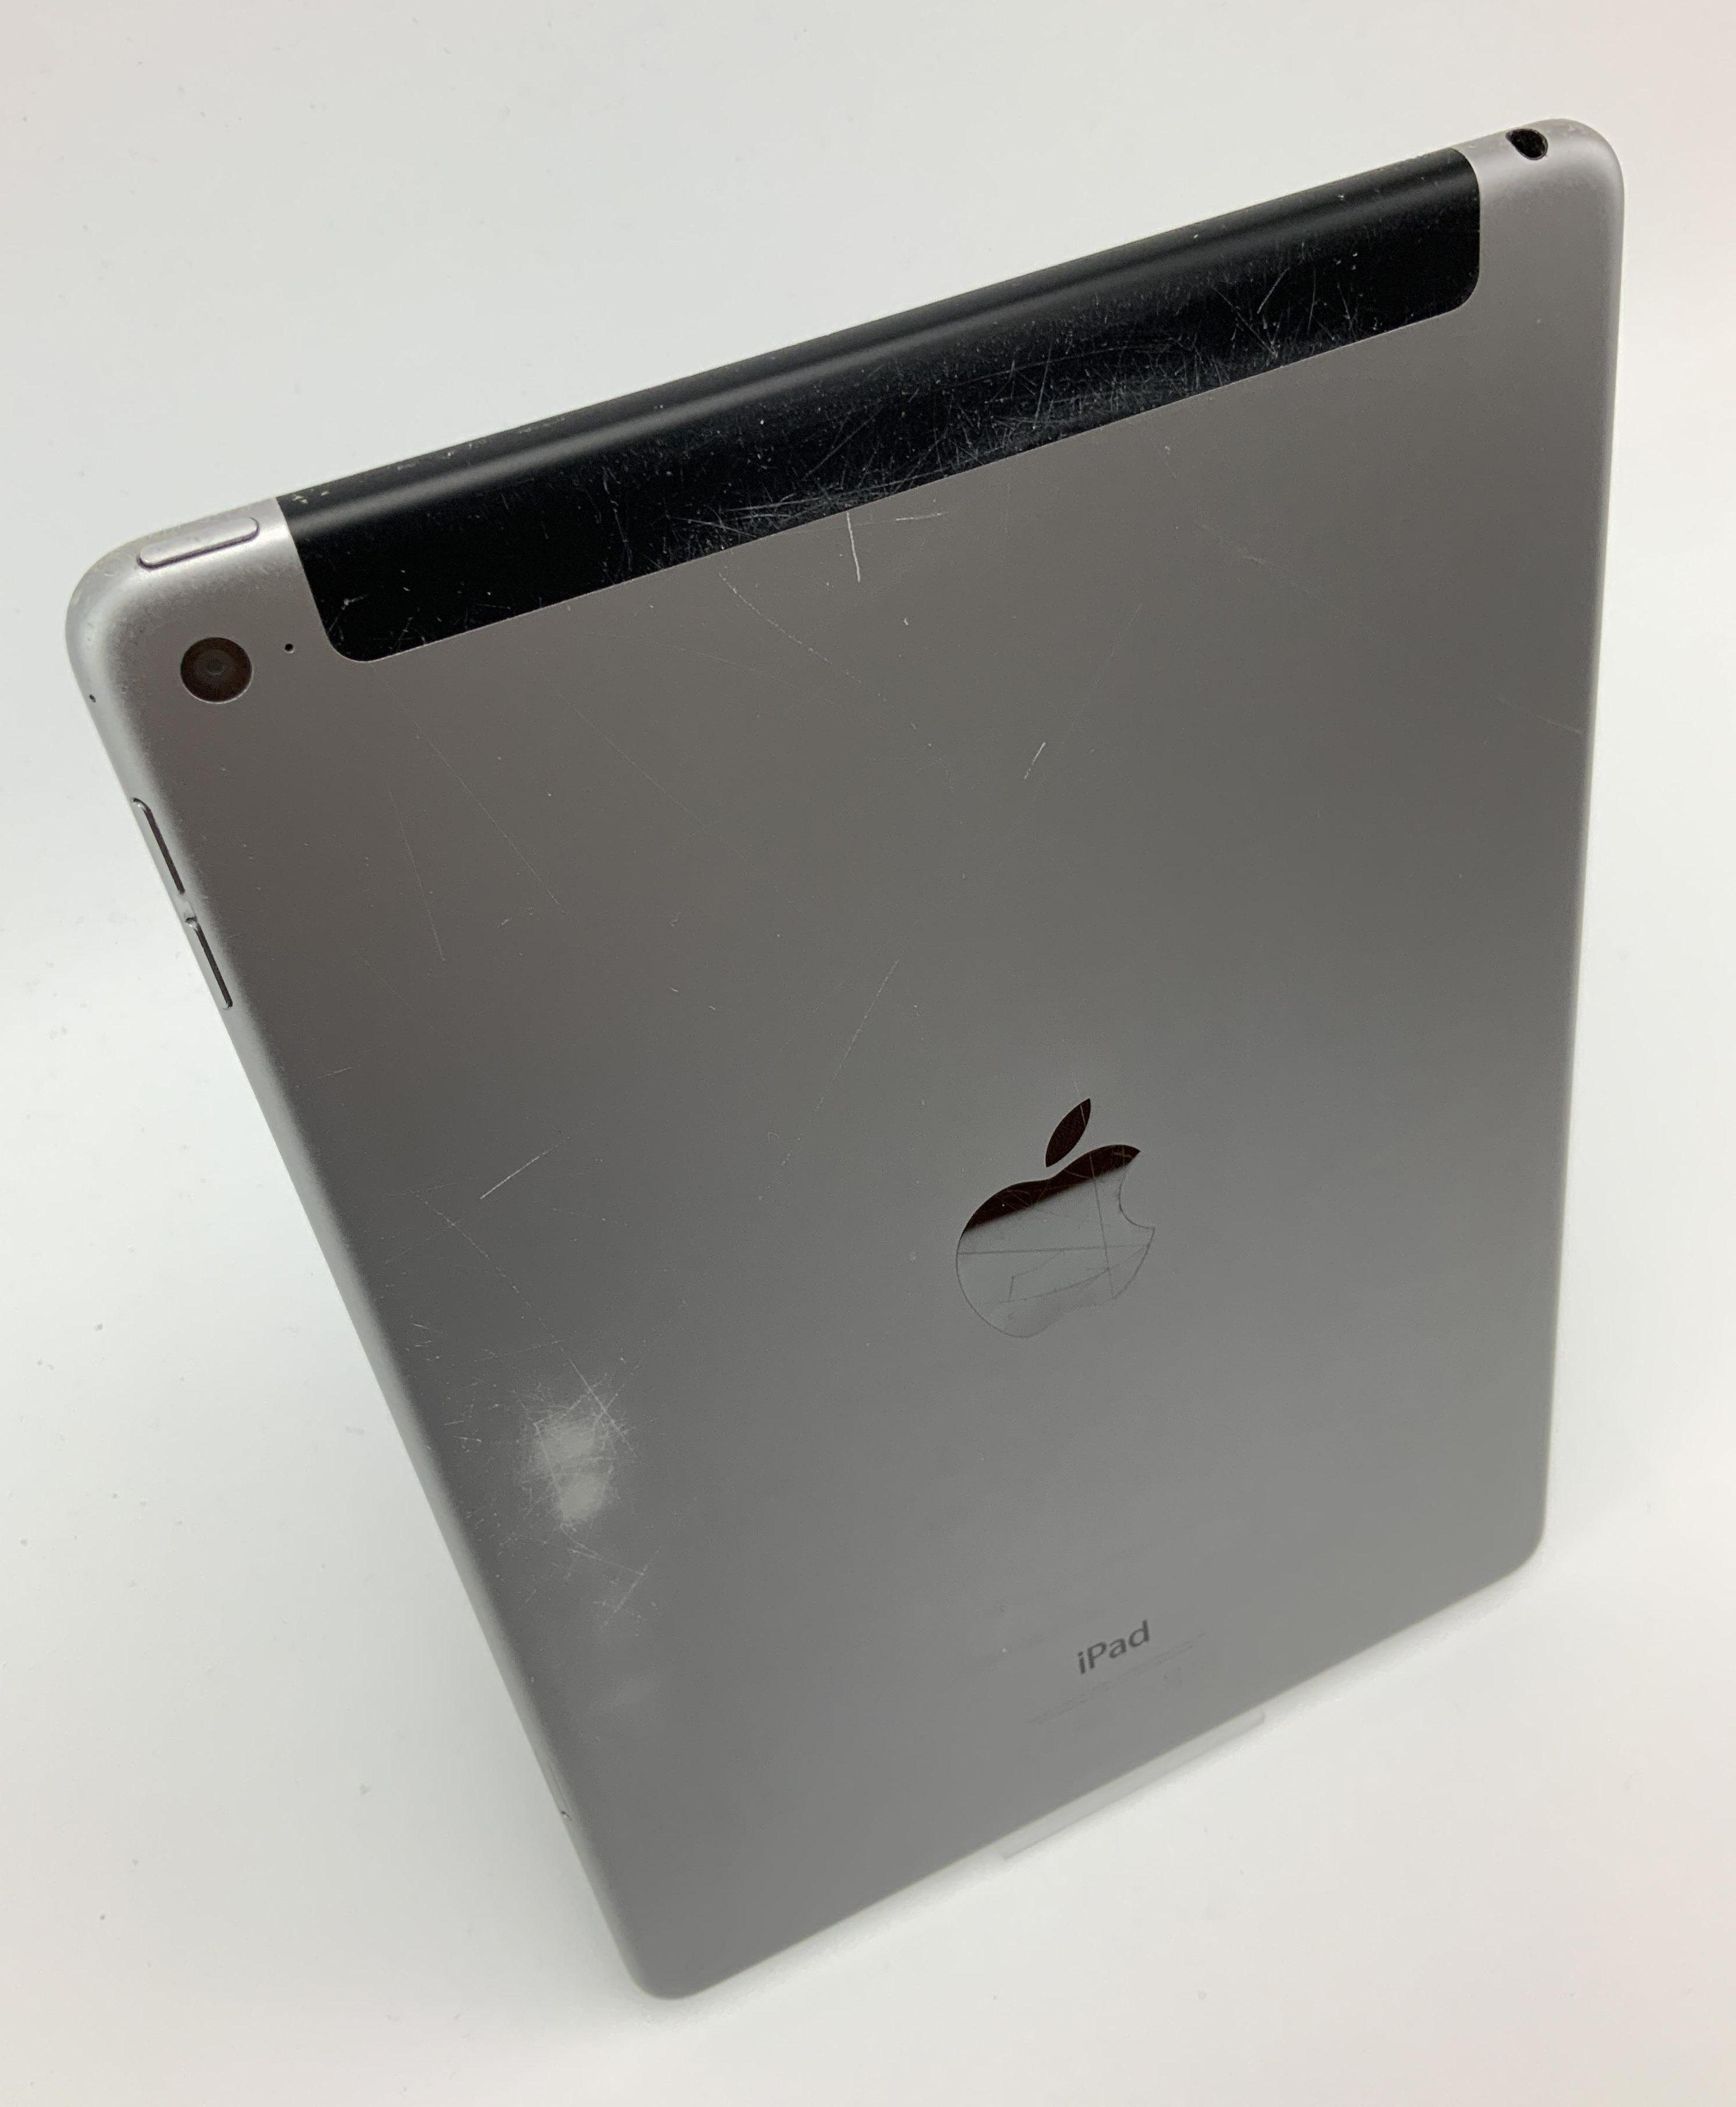 iPad Air 2 Wi-Fi + Cellular 16GB, 16GB, Space Gray, Afbeelding 3